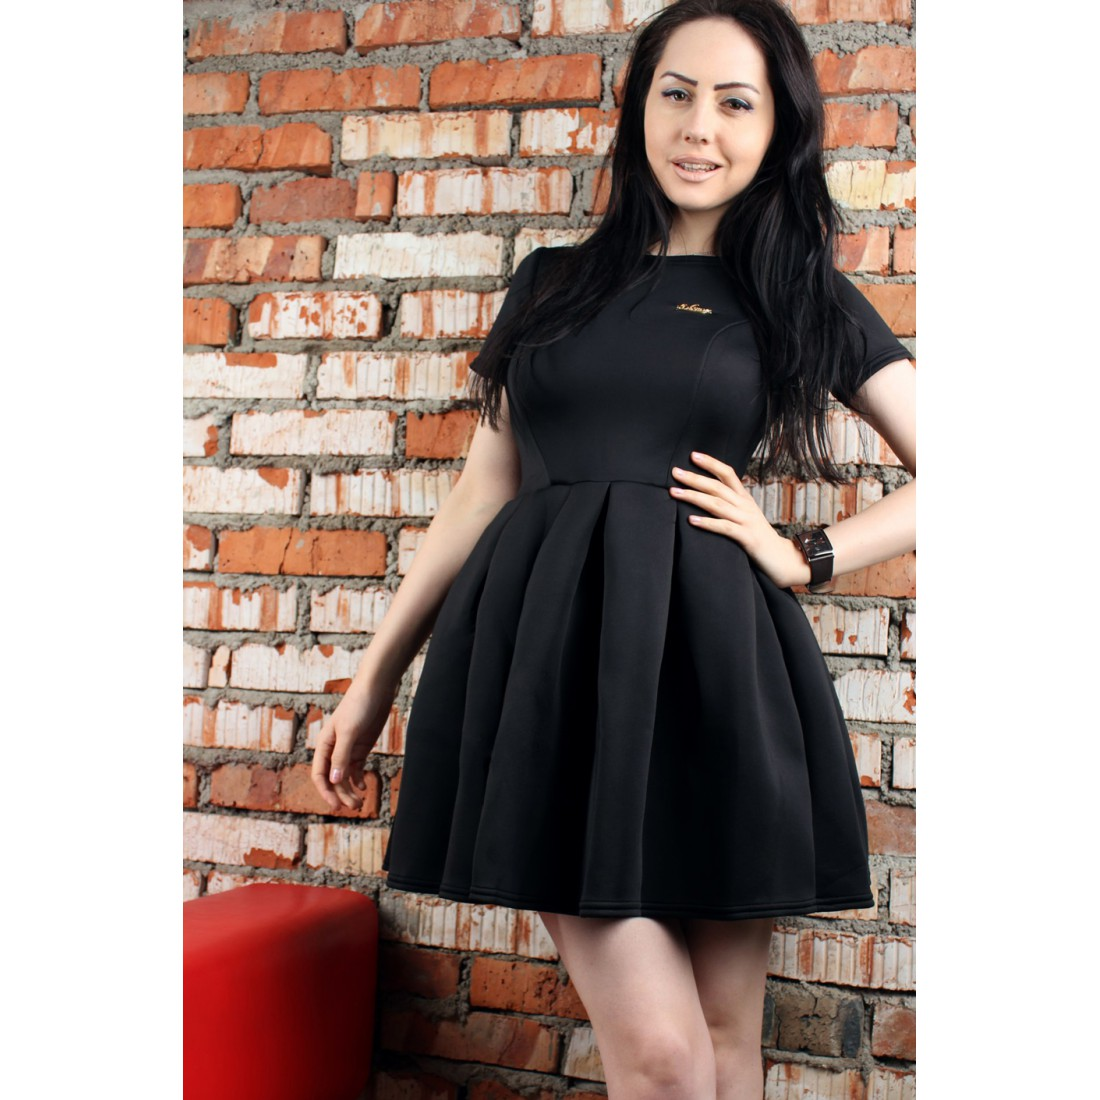 865618c2bc4 Черное платье Shanti в стиле бэби долл (Арт. R200-02)